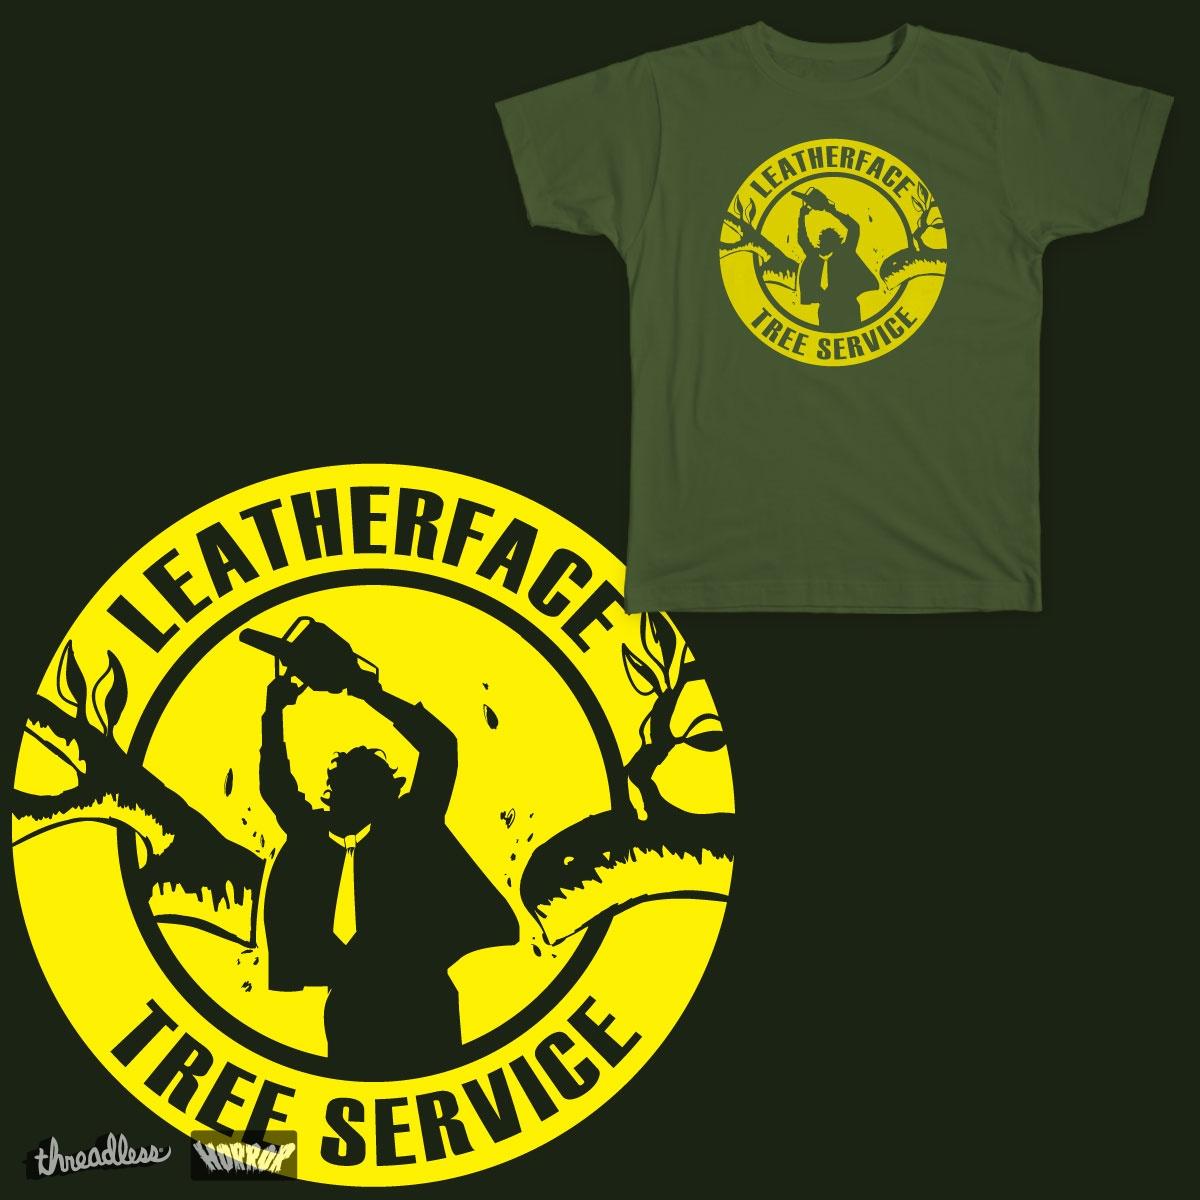 Leatherface Tree Service by Dan Smash on Threadless